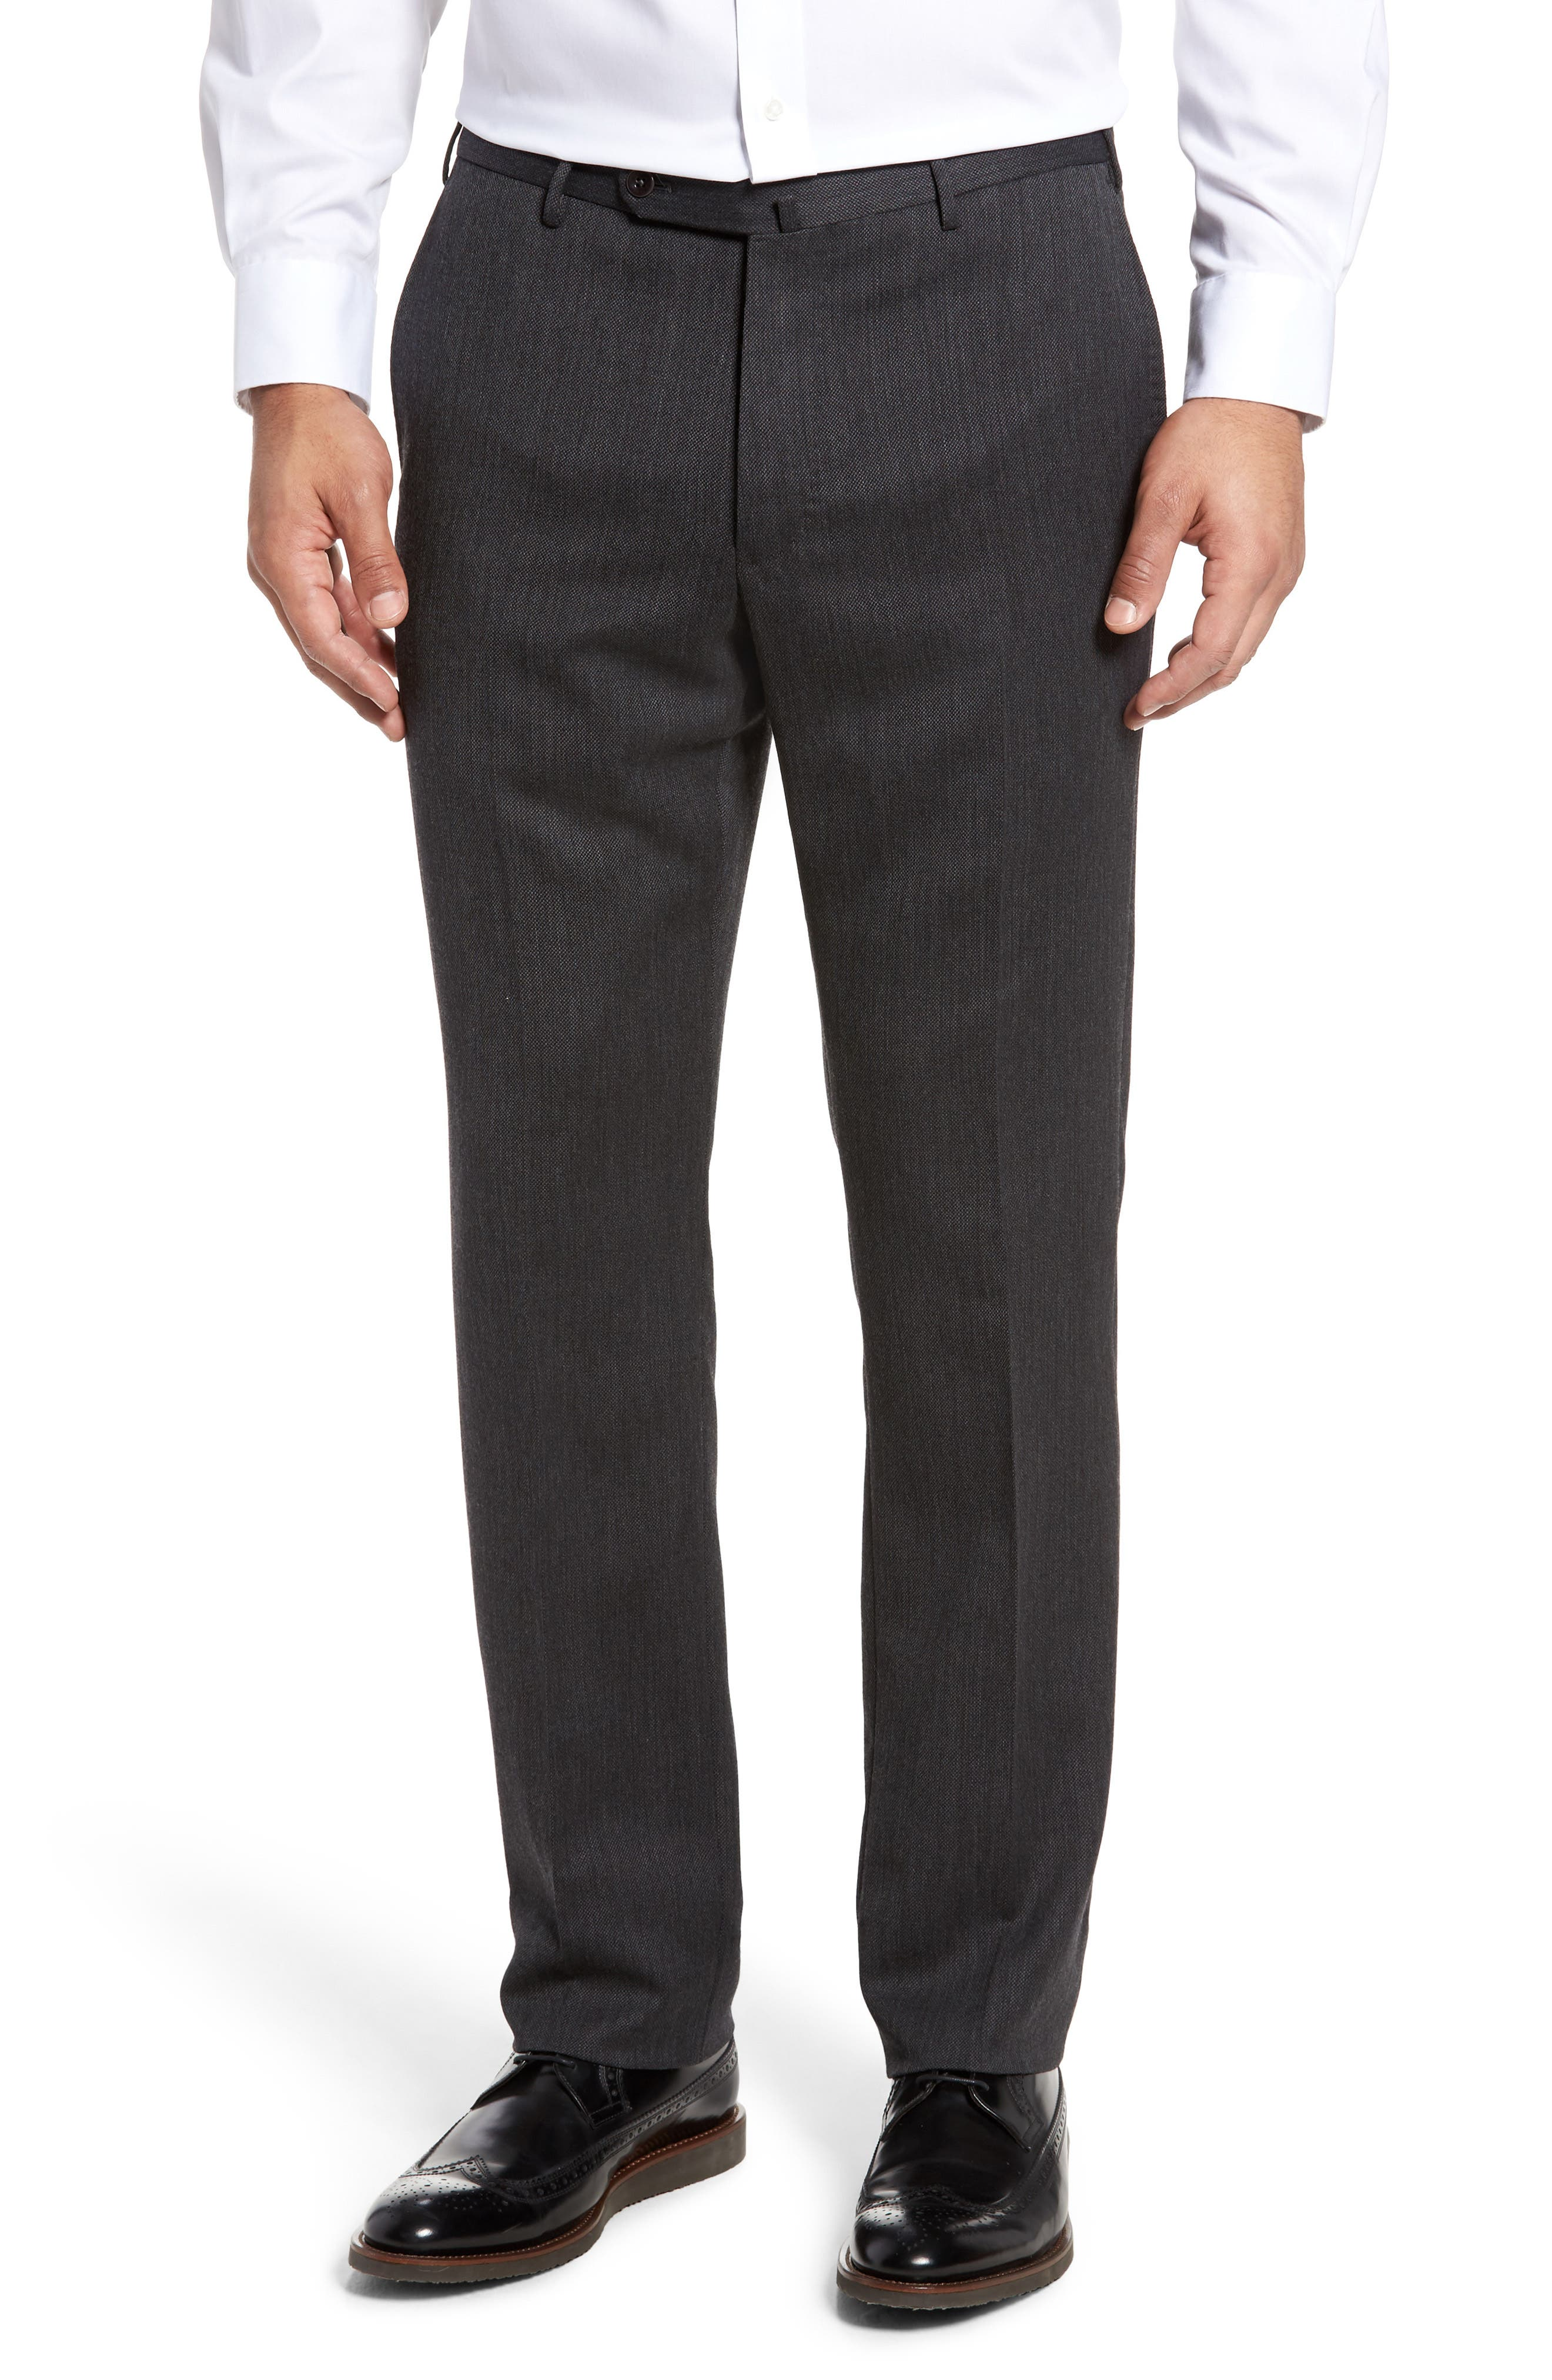 Benson Flat Front Wool Blend Trousers,                             Main thumbnail 1, color,                             Dark Grey